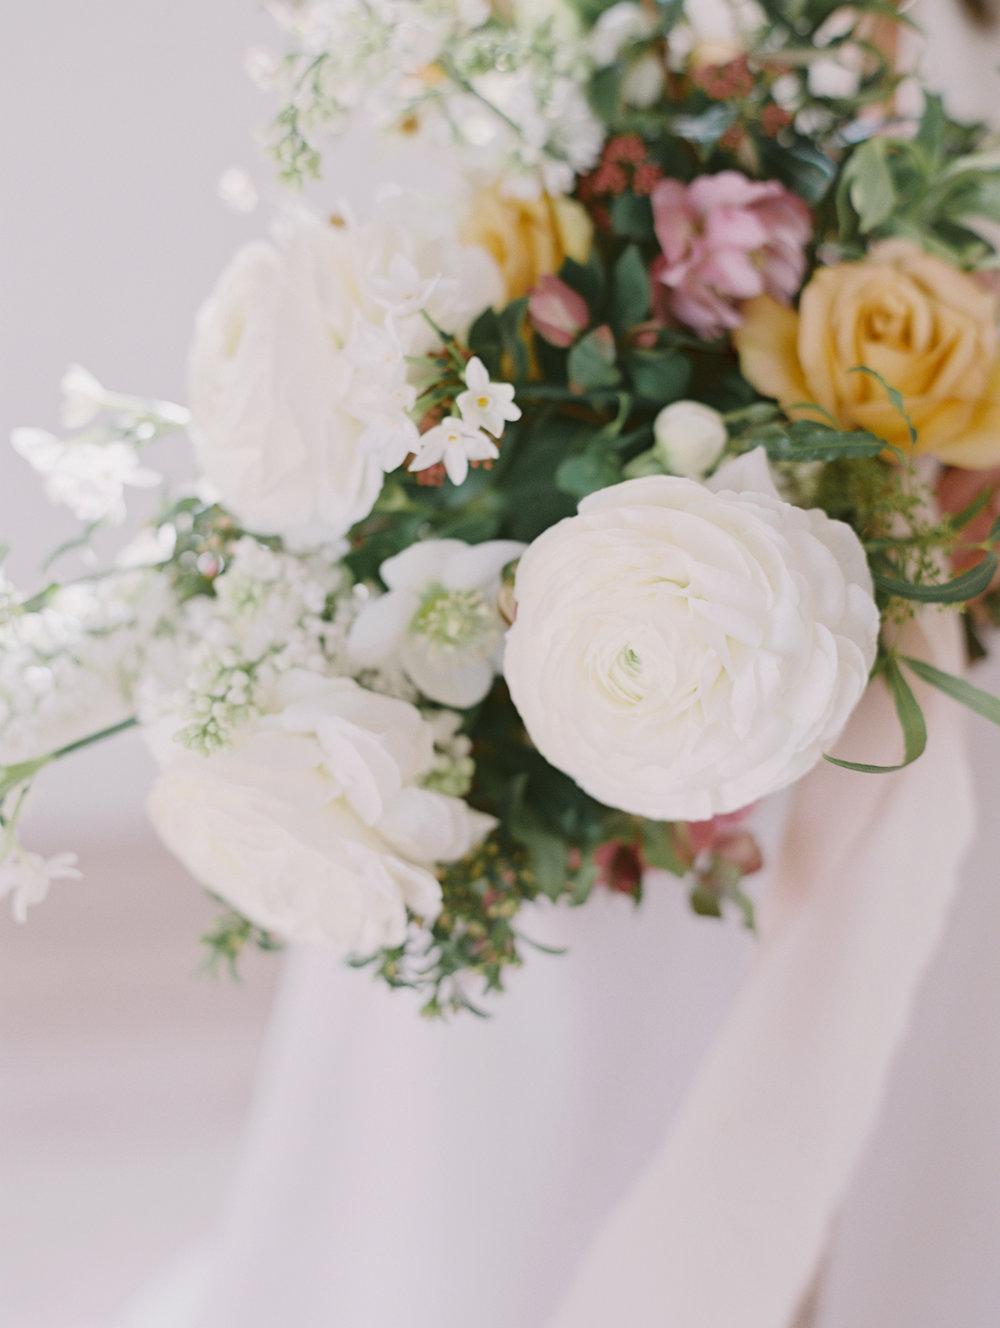 japanese ranunculus wedding bouquet with hellebores.jpg